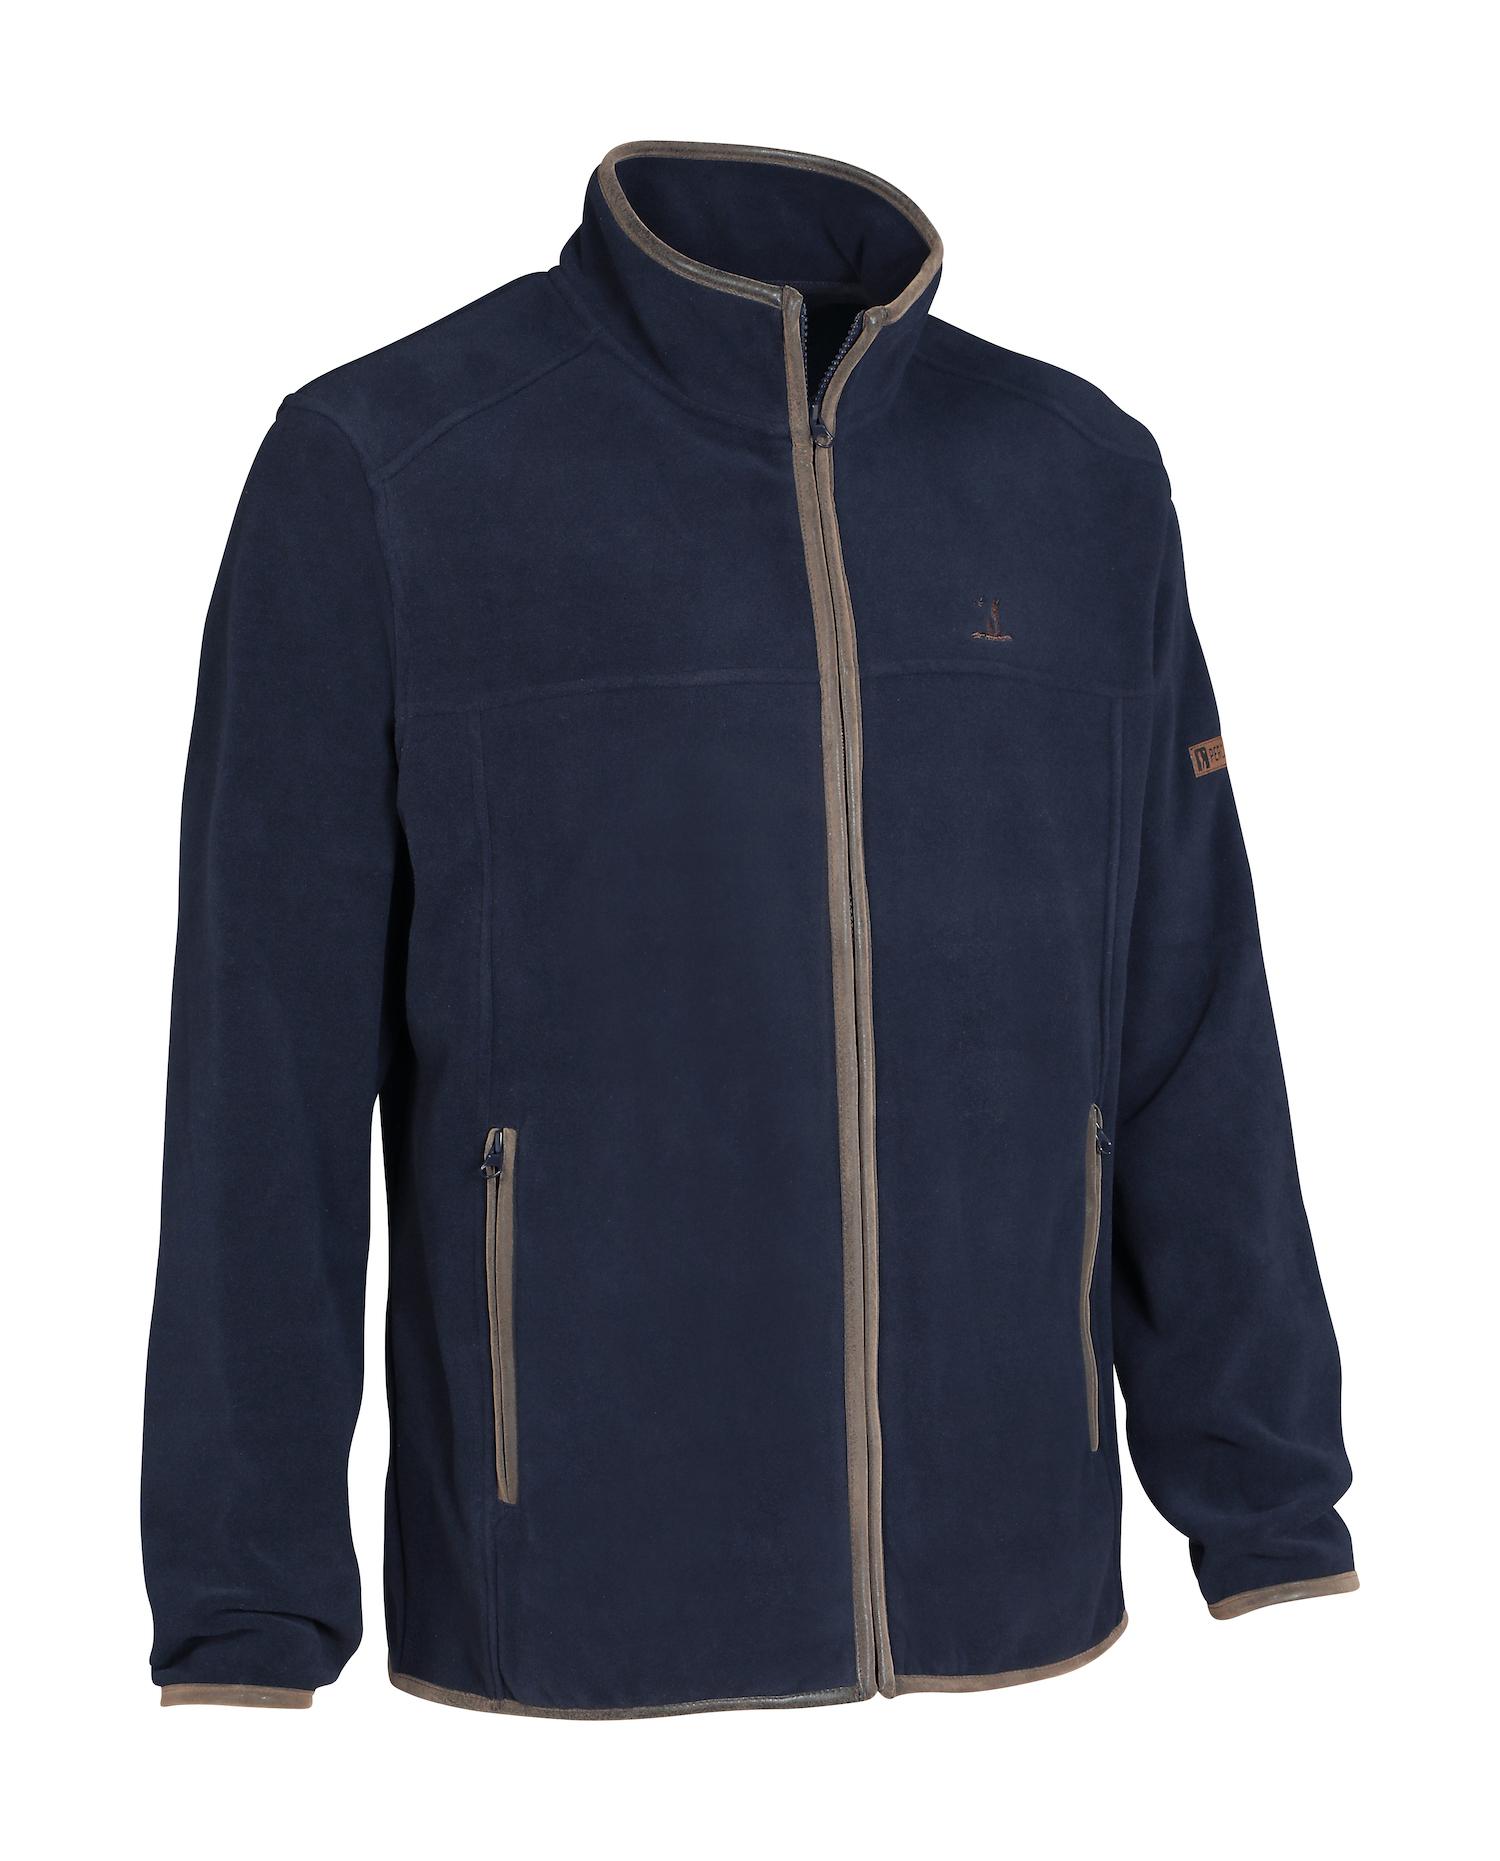 Percussion Scotland Fleece Jacket in Navy